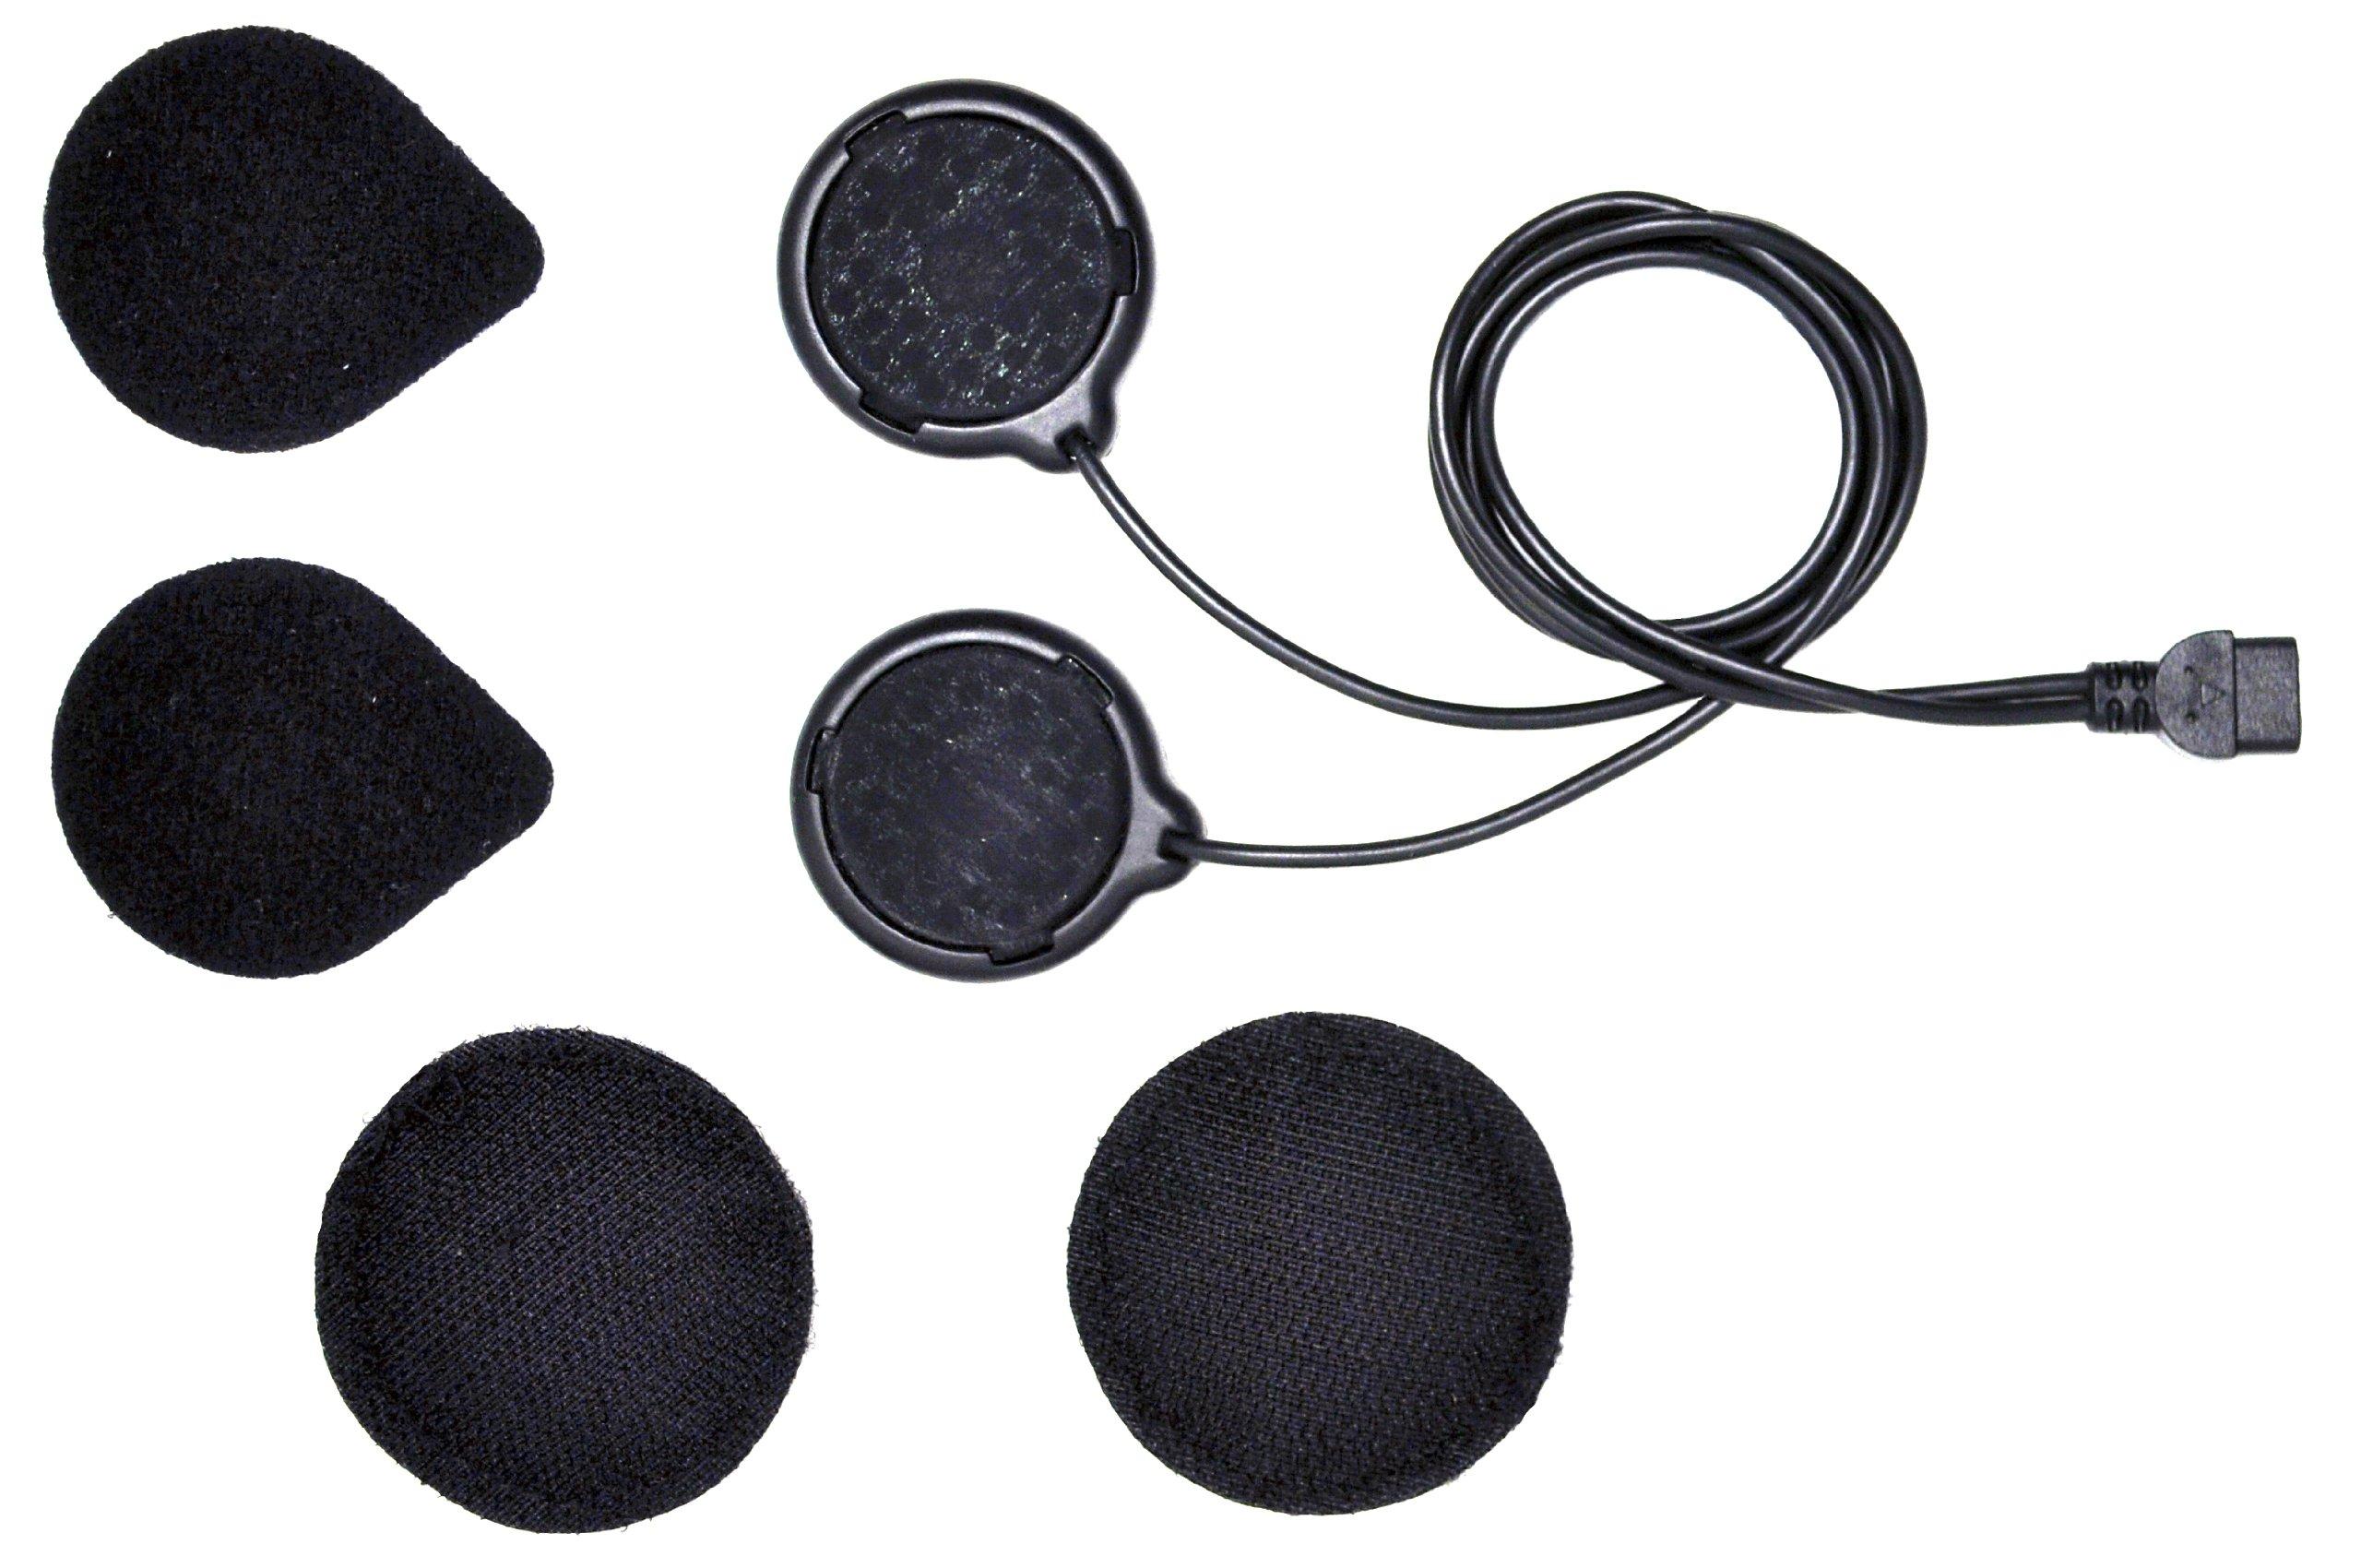 Sena Slim Speaker for SMH10R Bluetooth Headset (SMH10R-A0202)